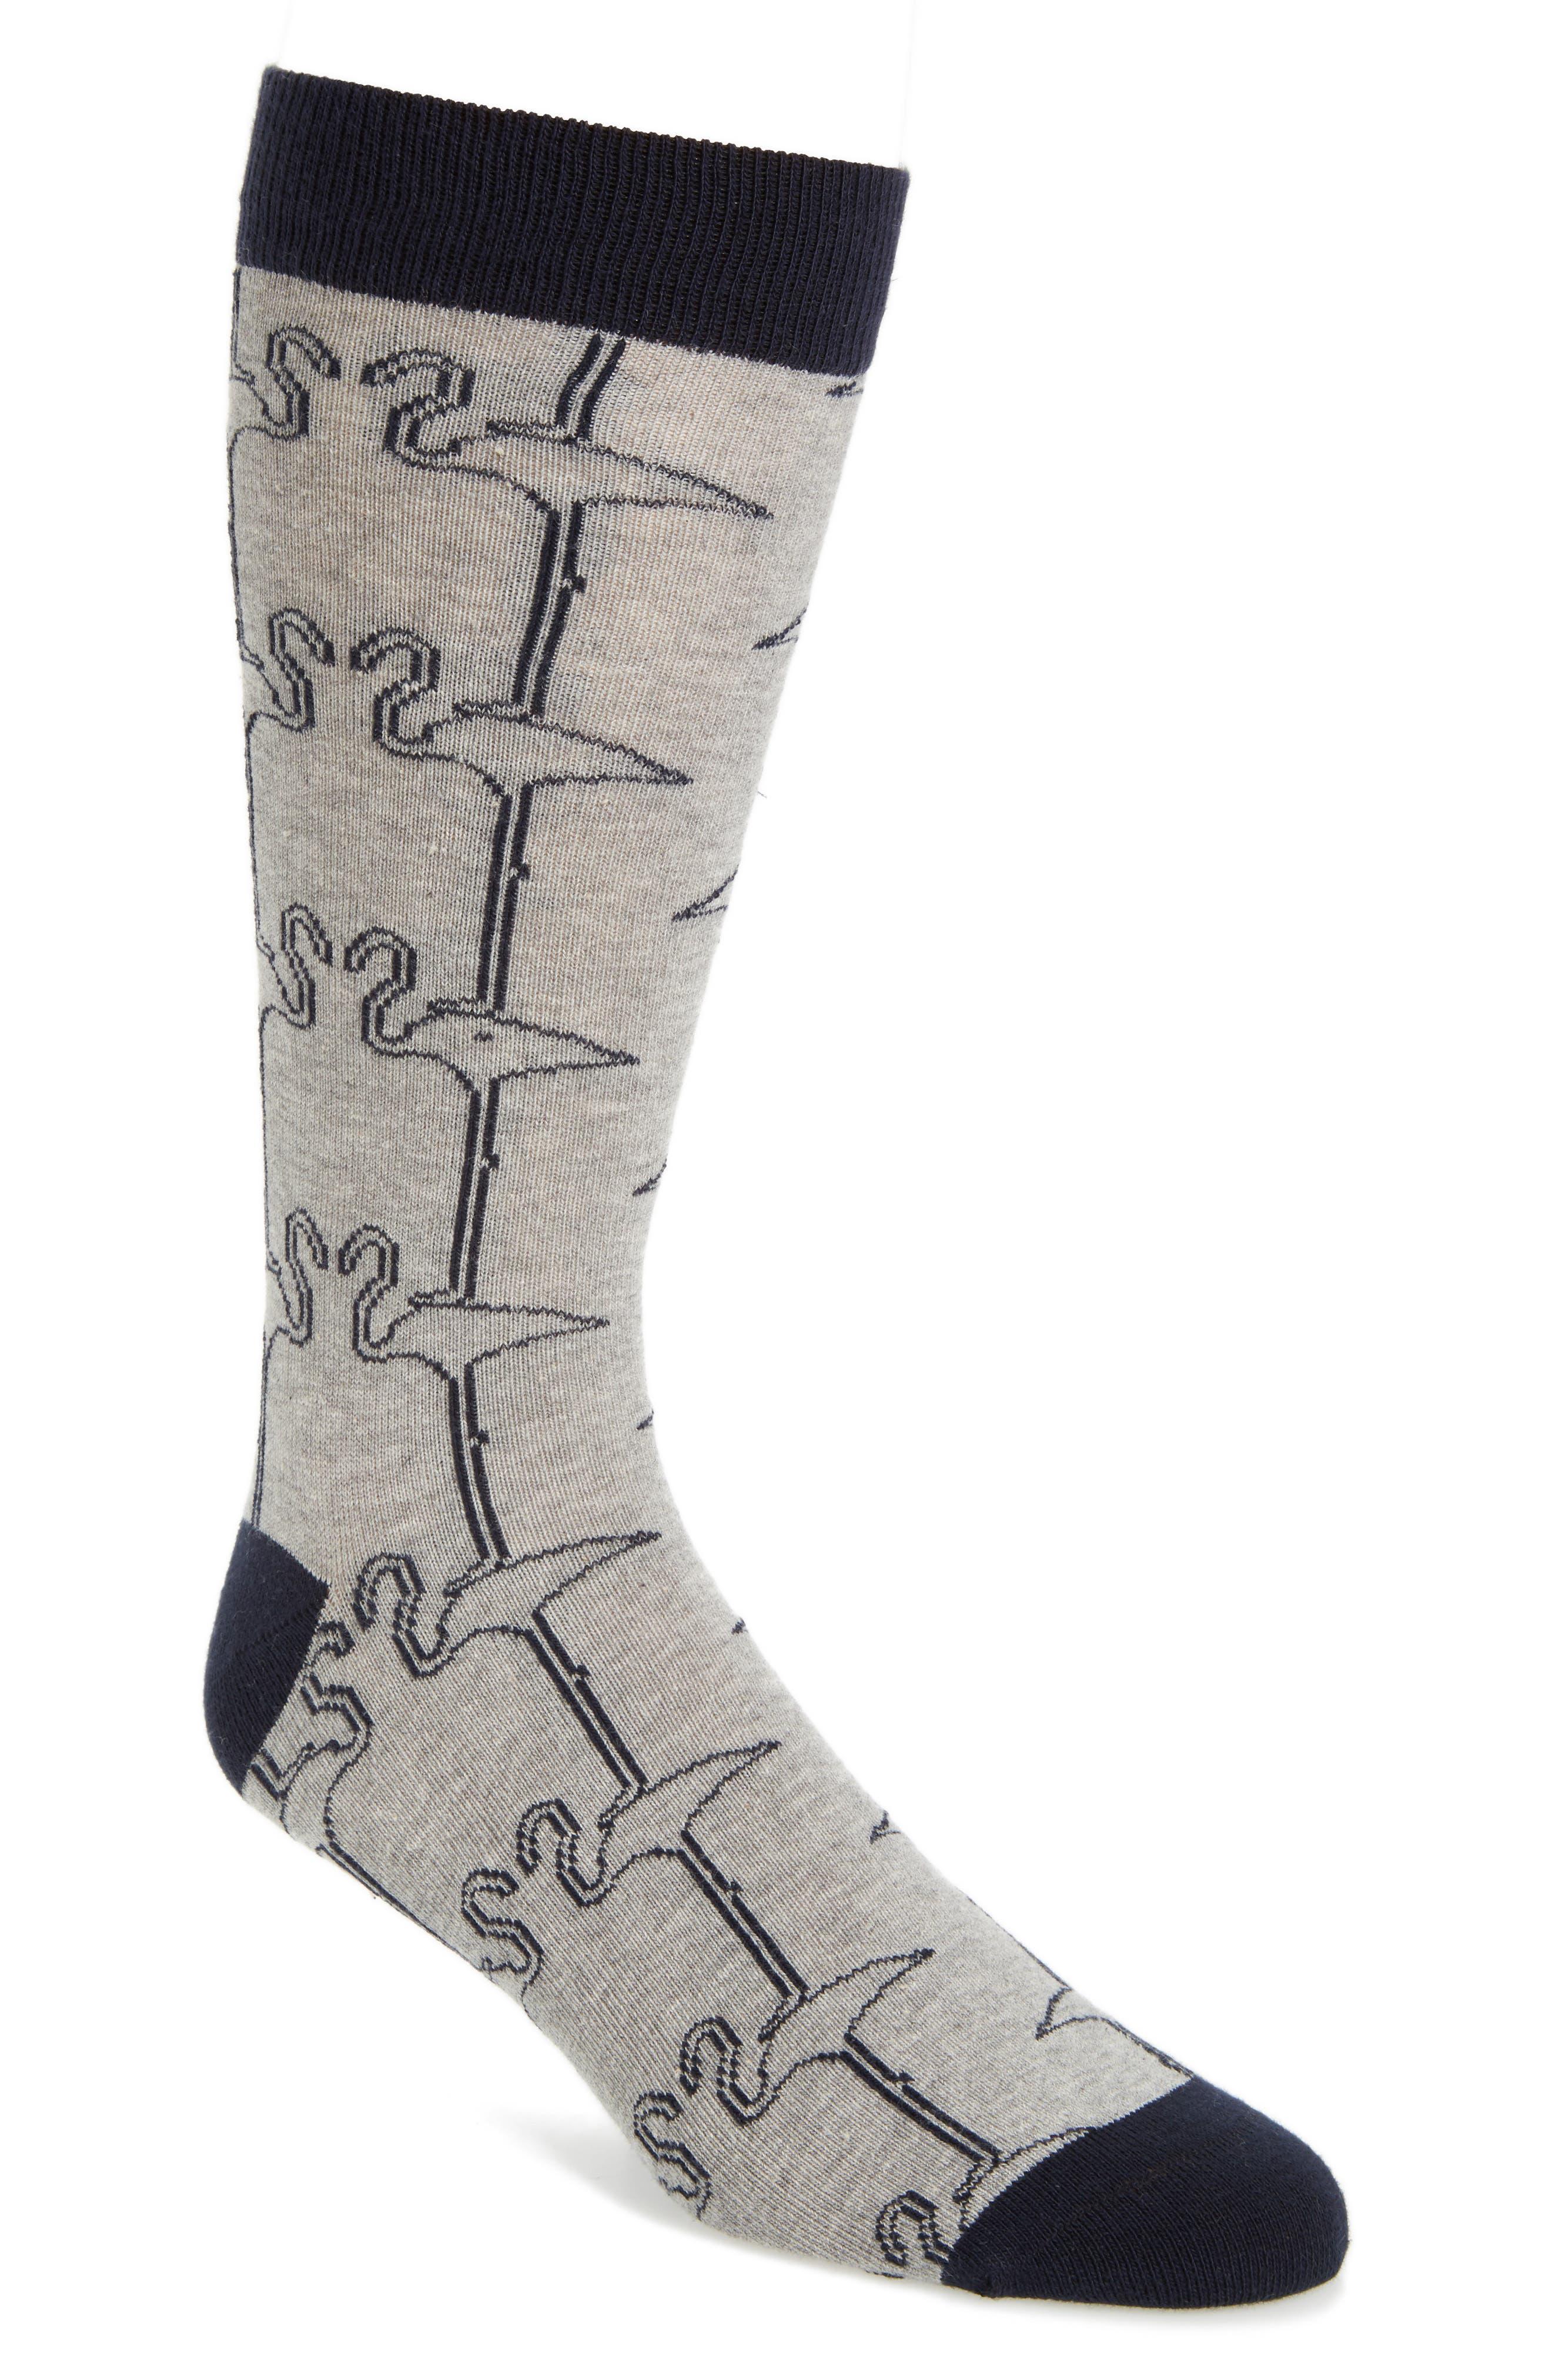 Miami Flamingo Print Crew Socks, Main, color, 030